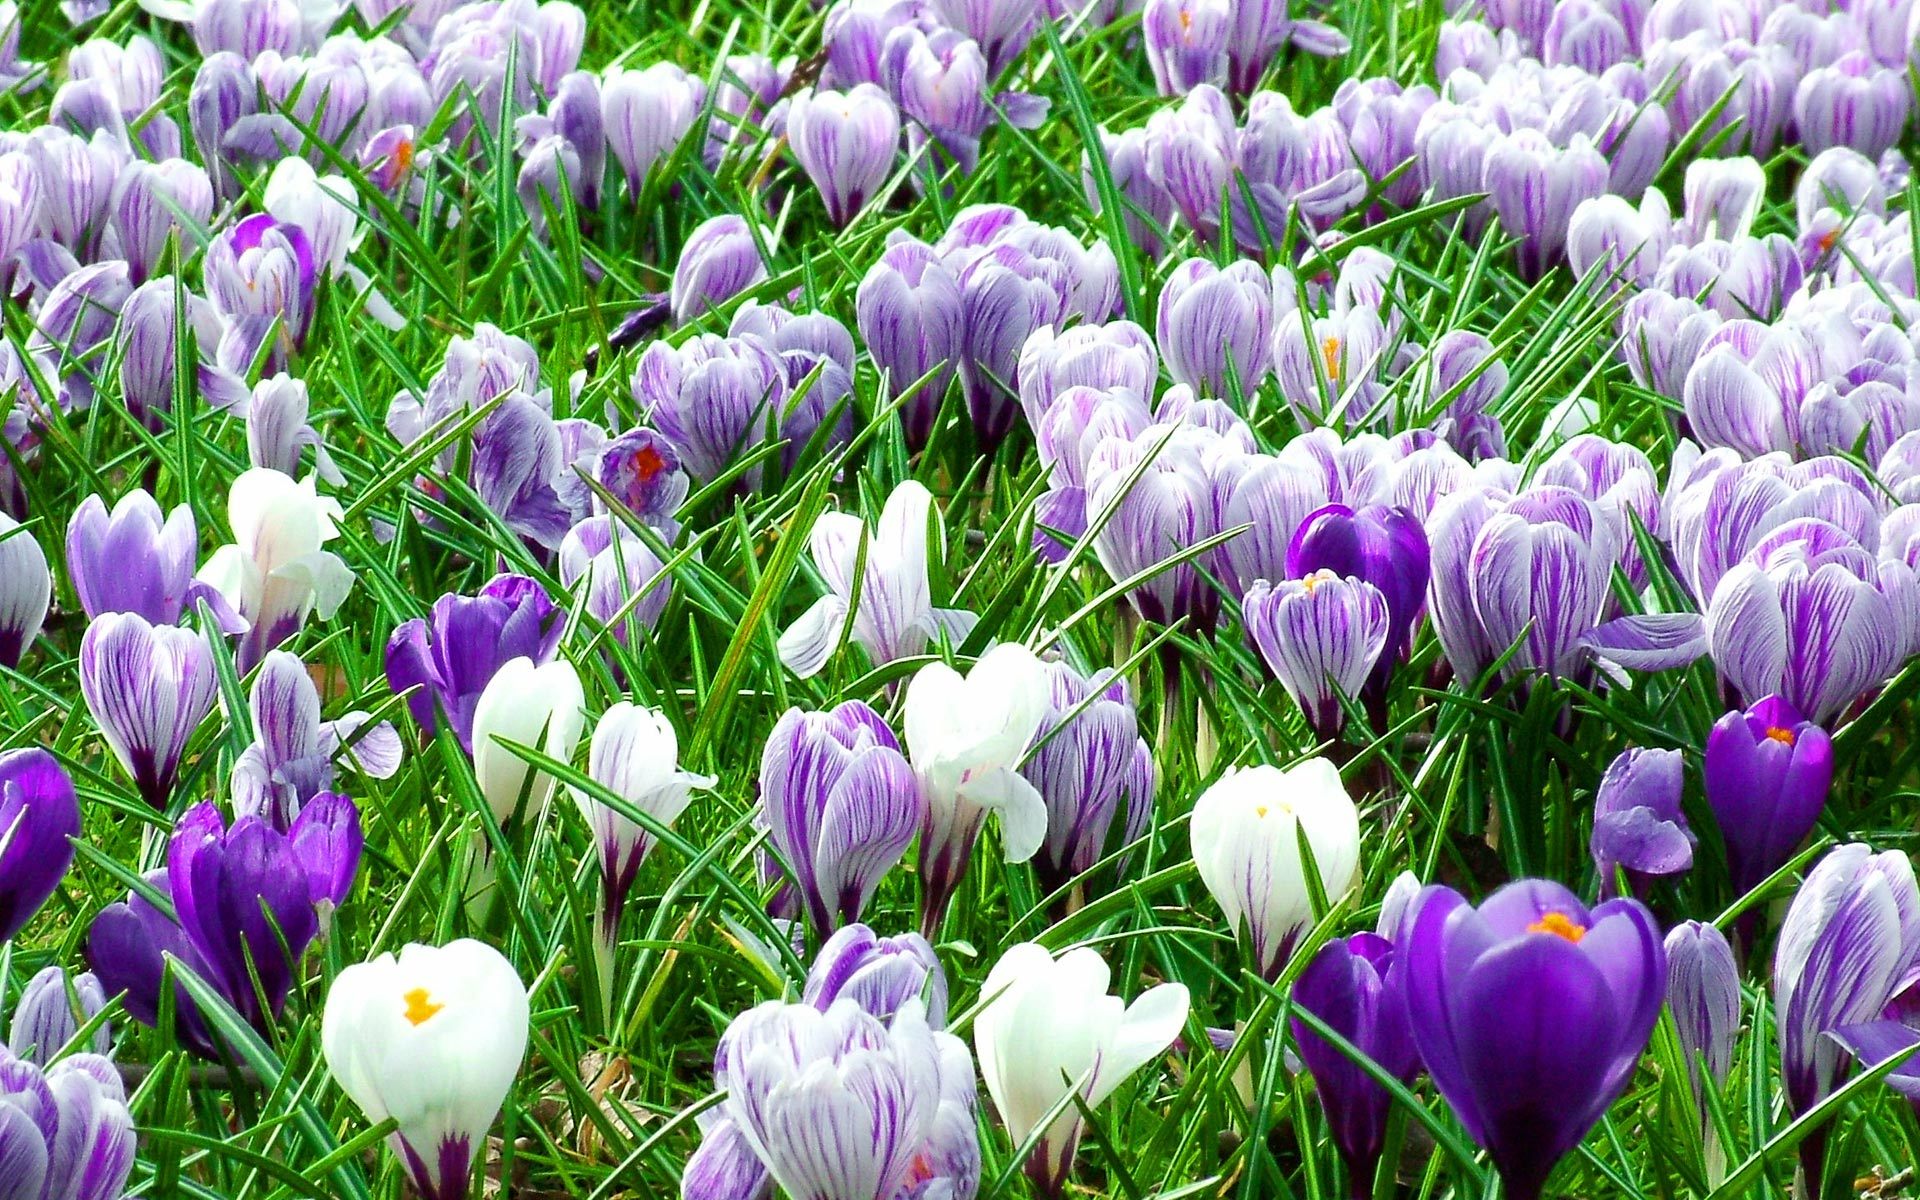 Фото 28: spring-flowers-15_smiling-da-vinci_nc